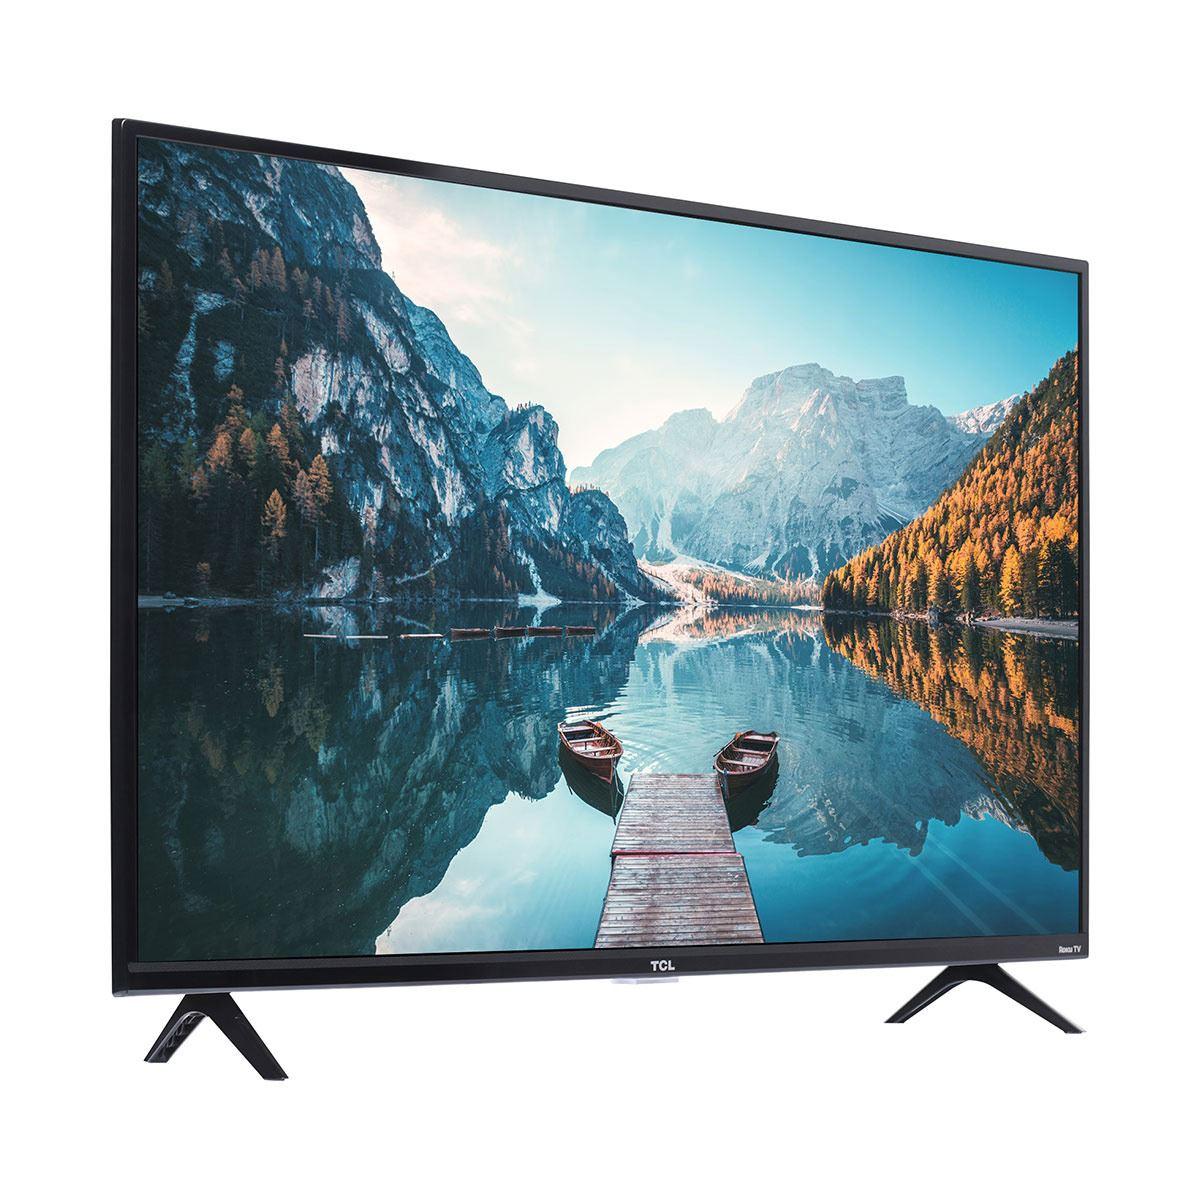 "Pantalla TCL 40"" FHD Smart TV (ROKU TV) 40S331-MX"